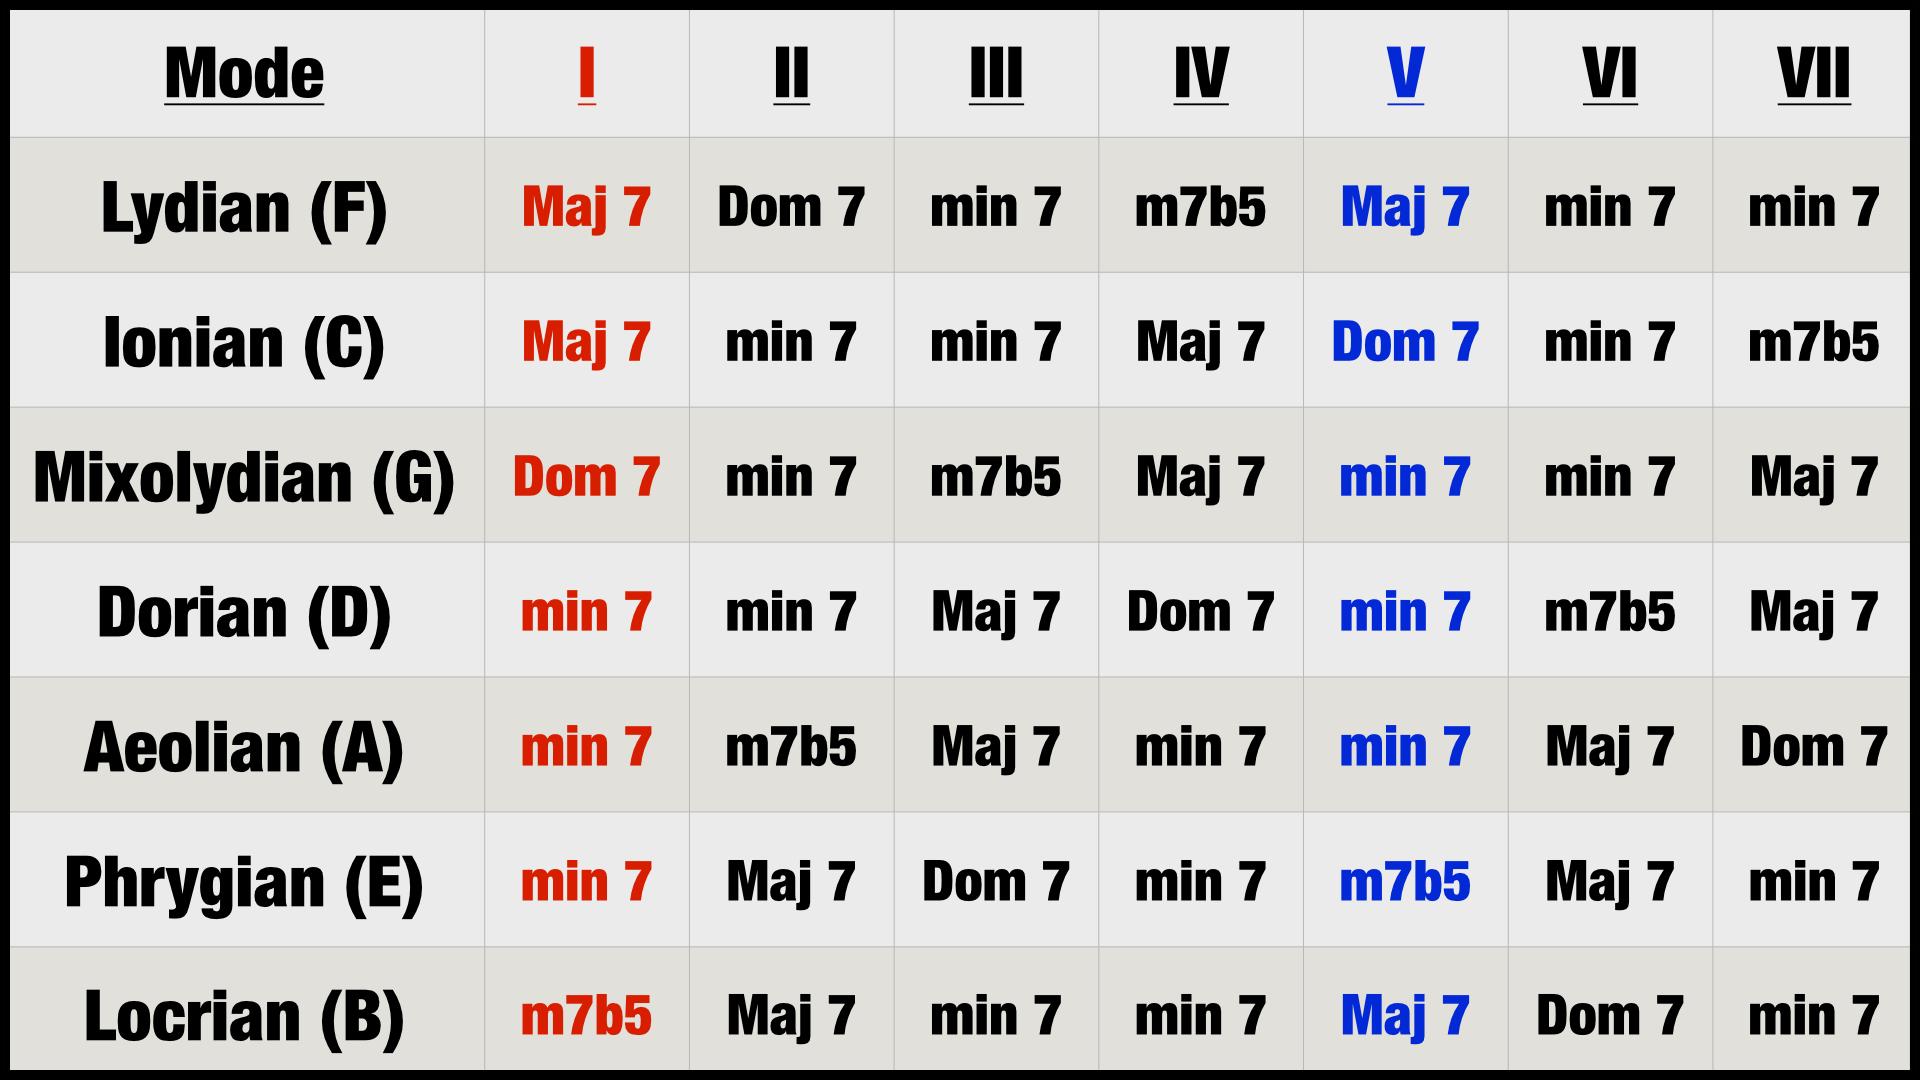 Modes Chord Chart (7th Chords)